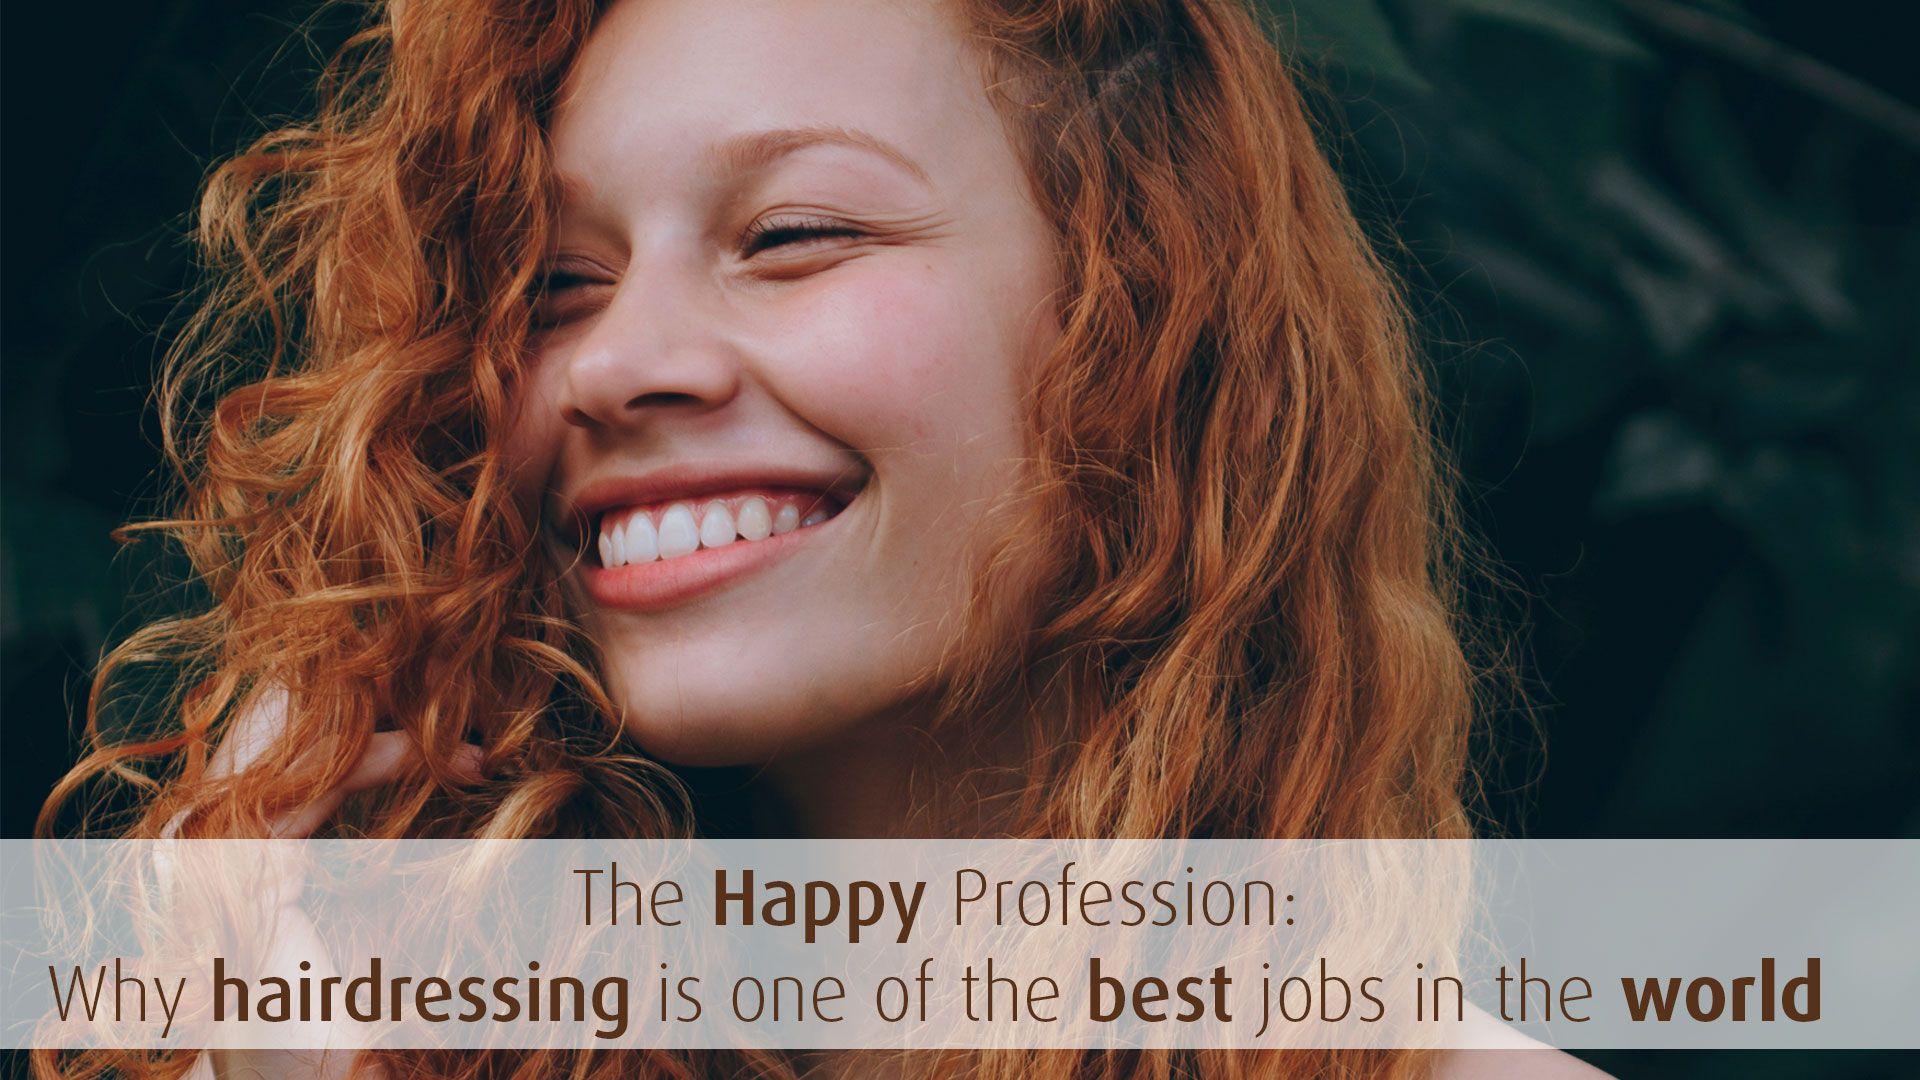 The happy profession